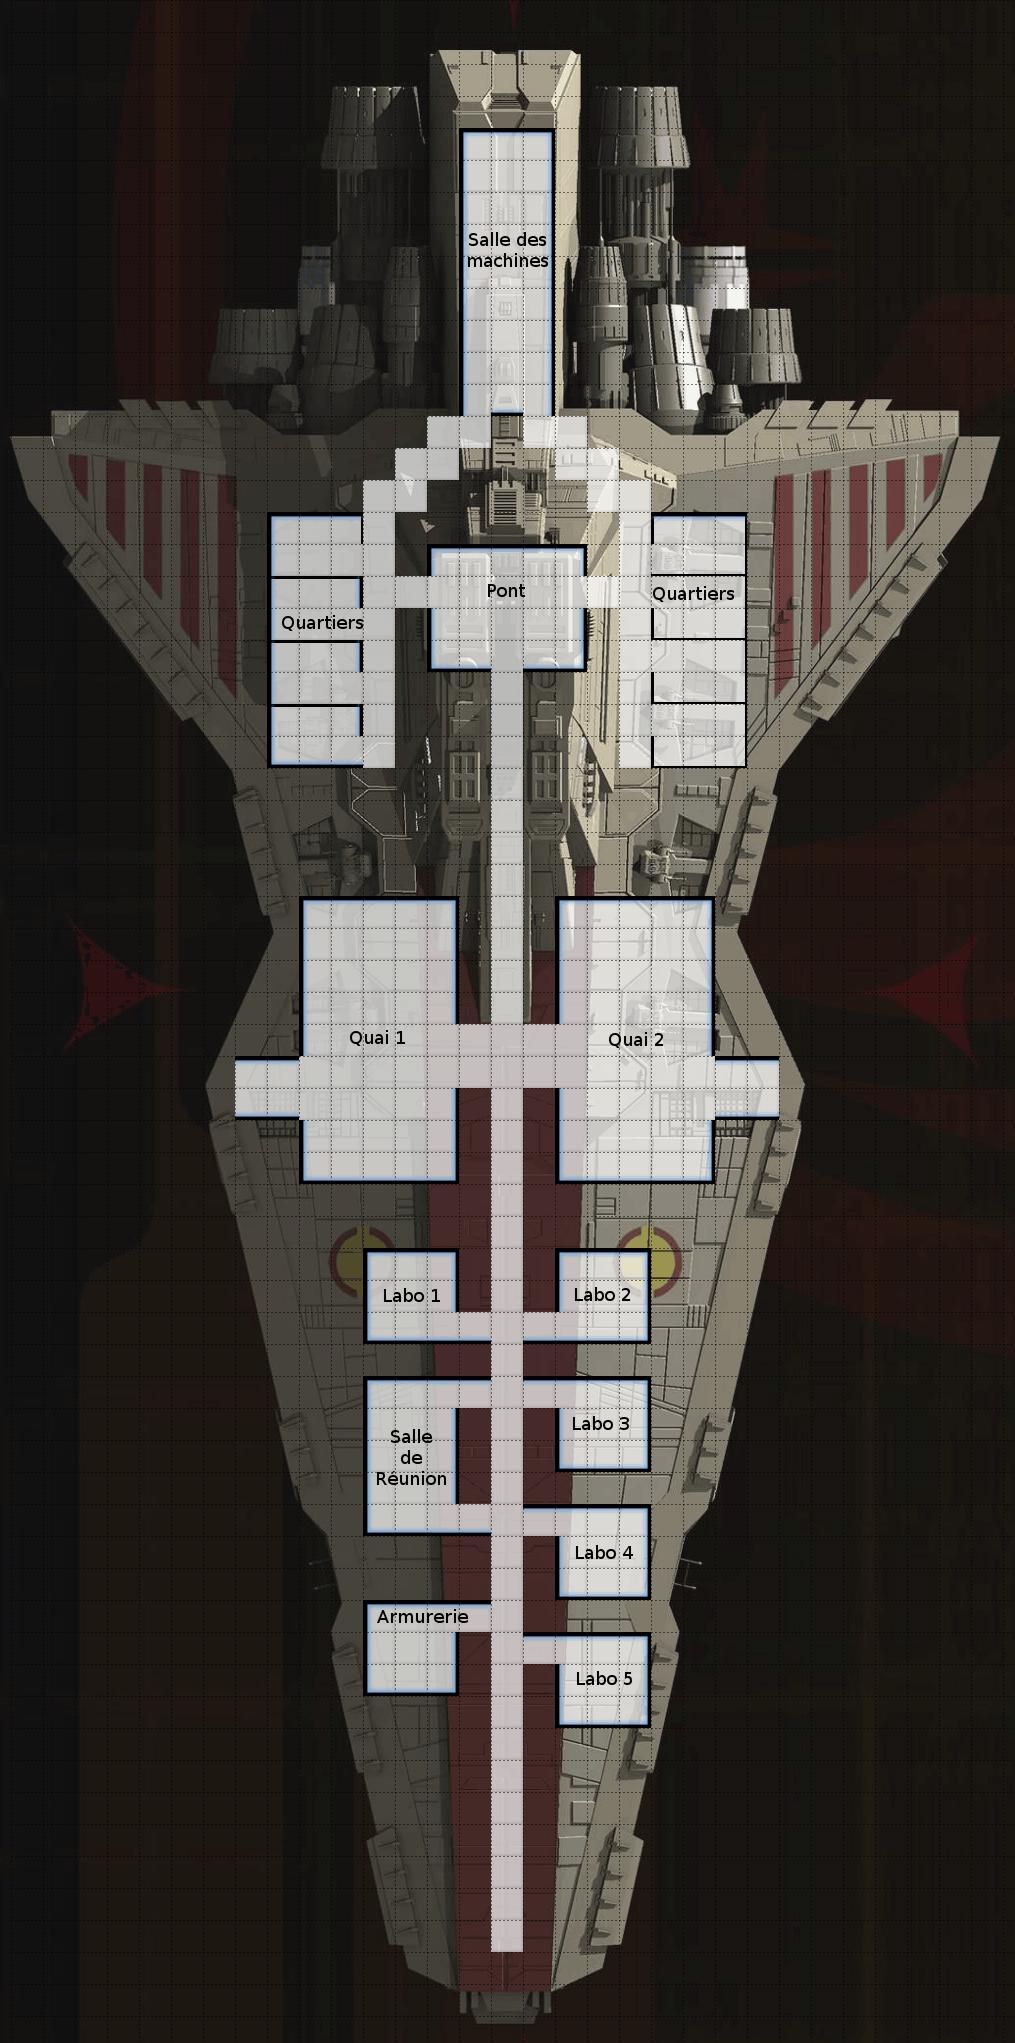 img/scenario/venator-plan.png